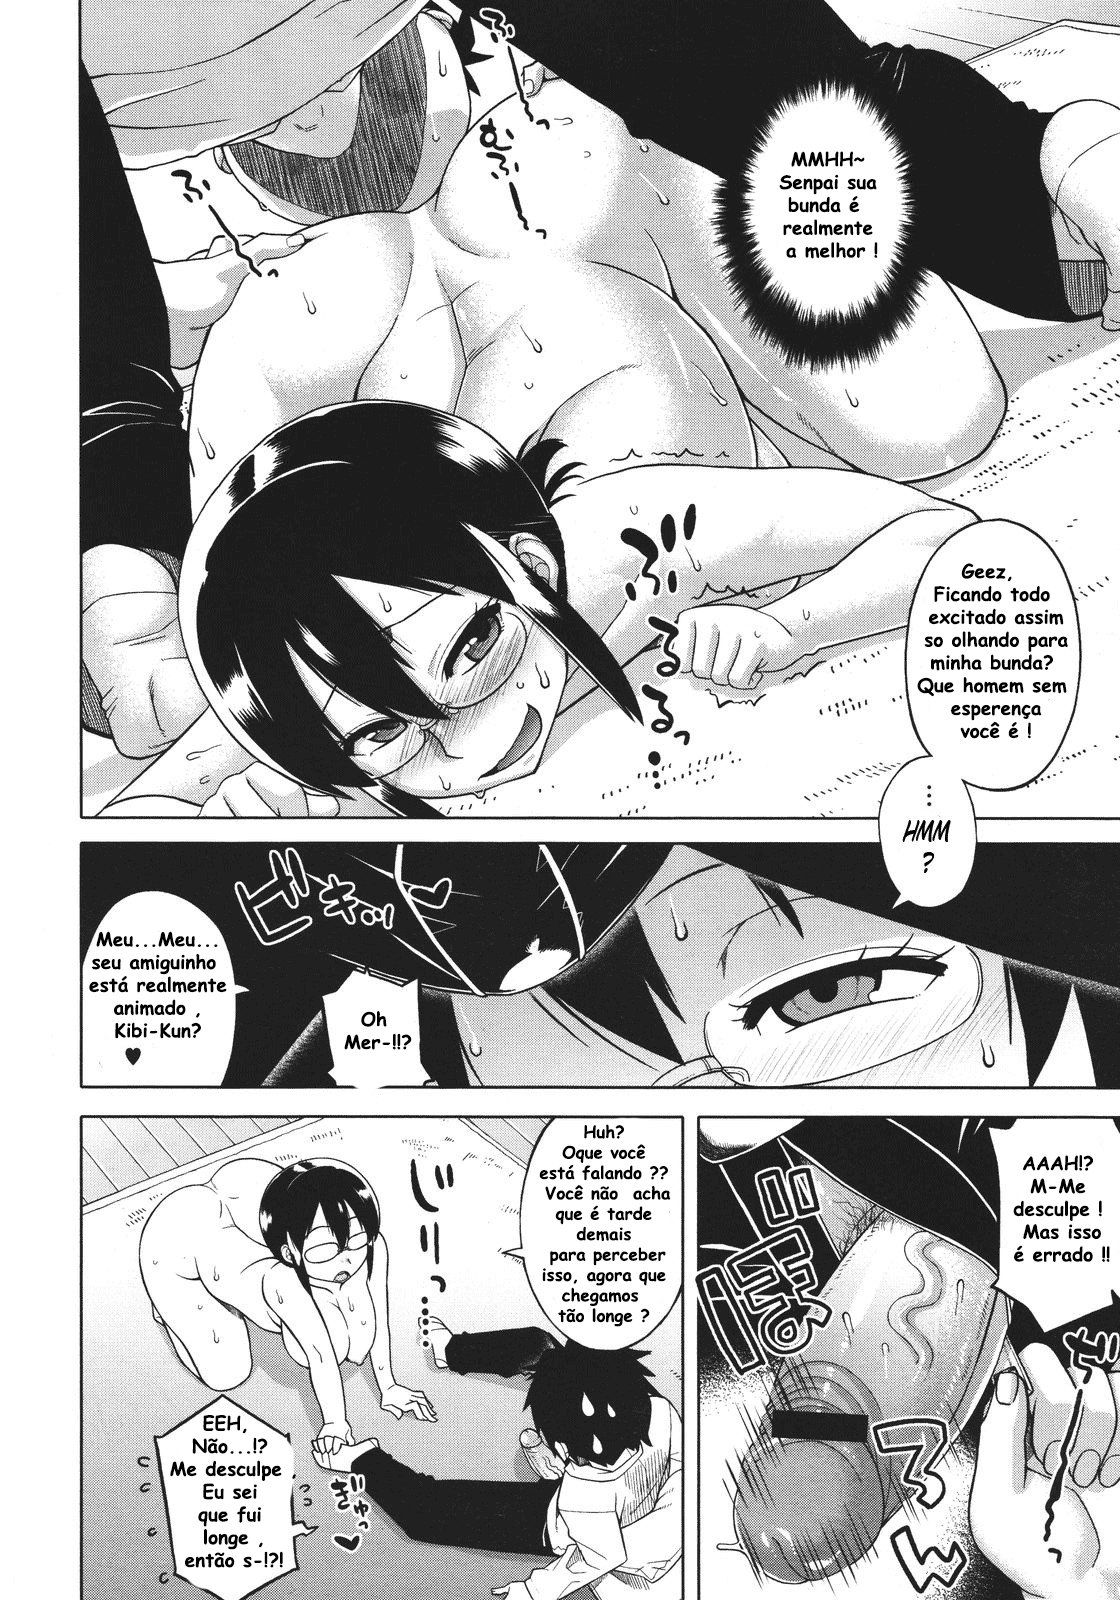 hentaihome.net-A-peituda-malvada-10